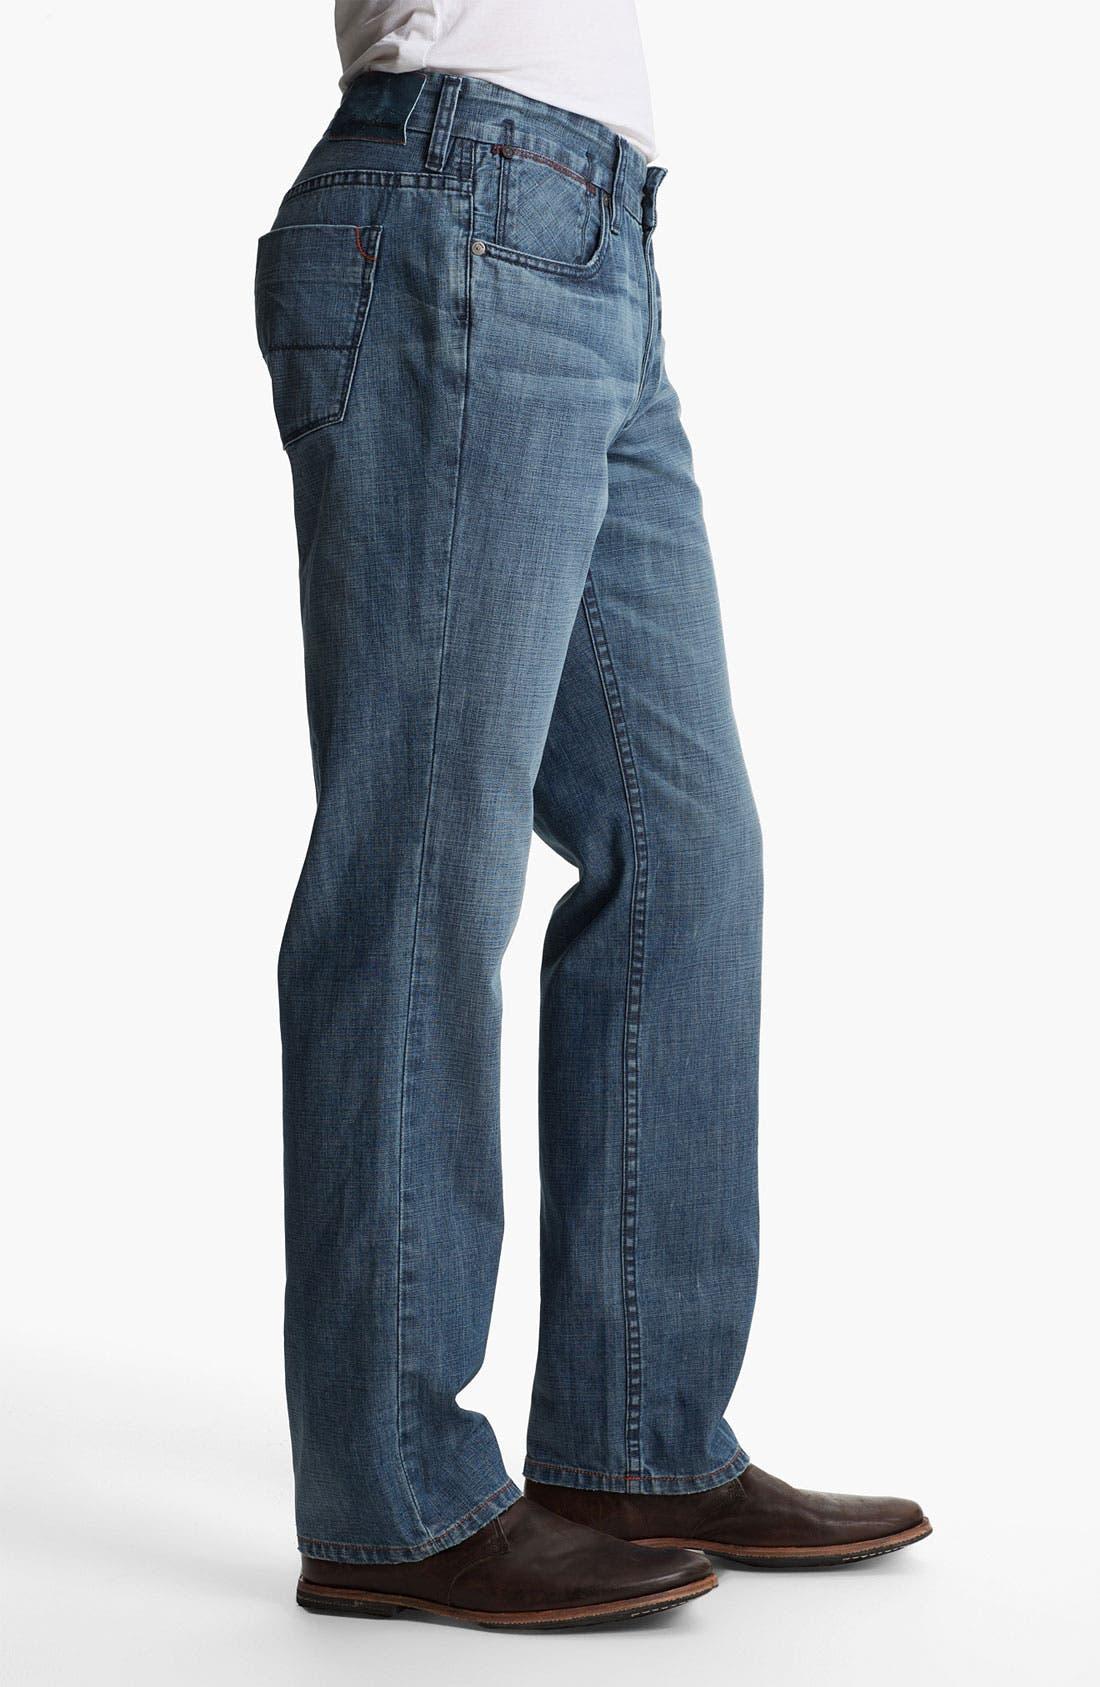 Alternate Image 3  - Tommy Bahama Denim 'Cruz' Authentic Fit Jeans (Medium)